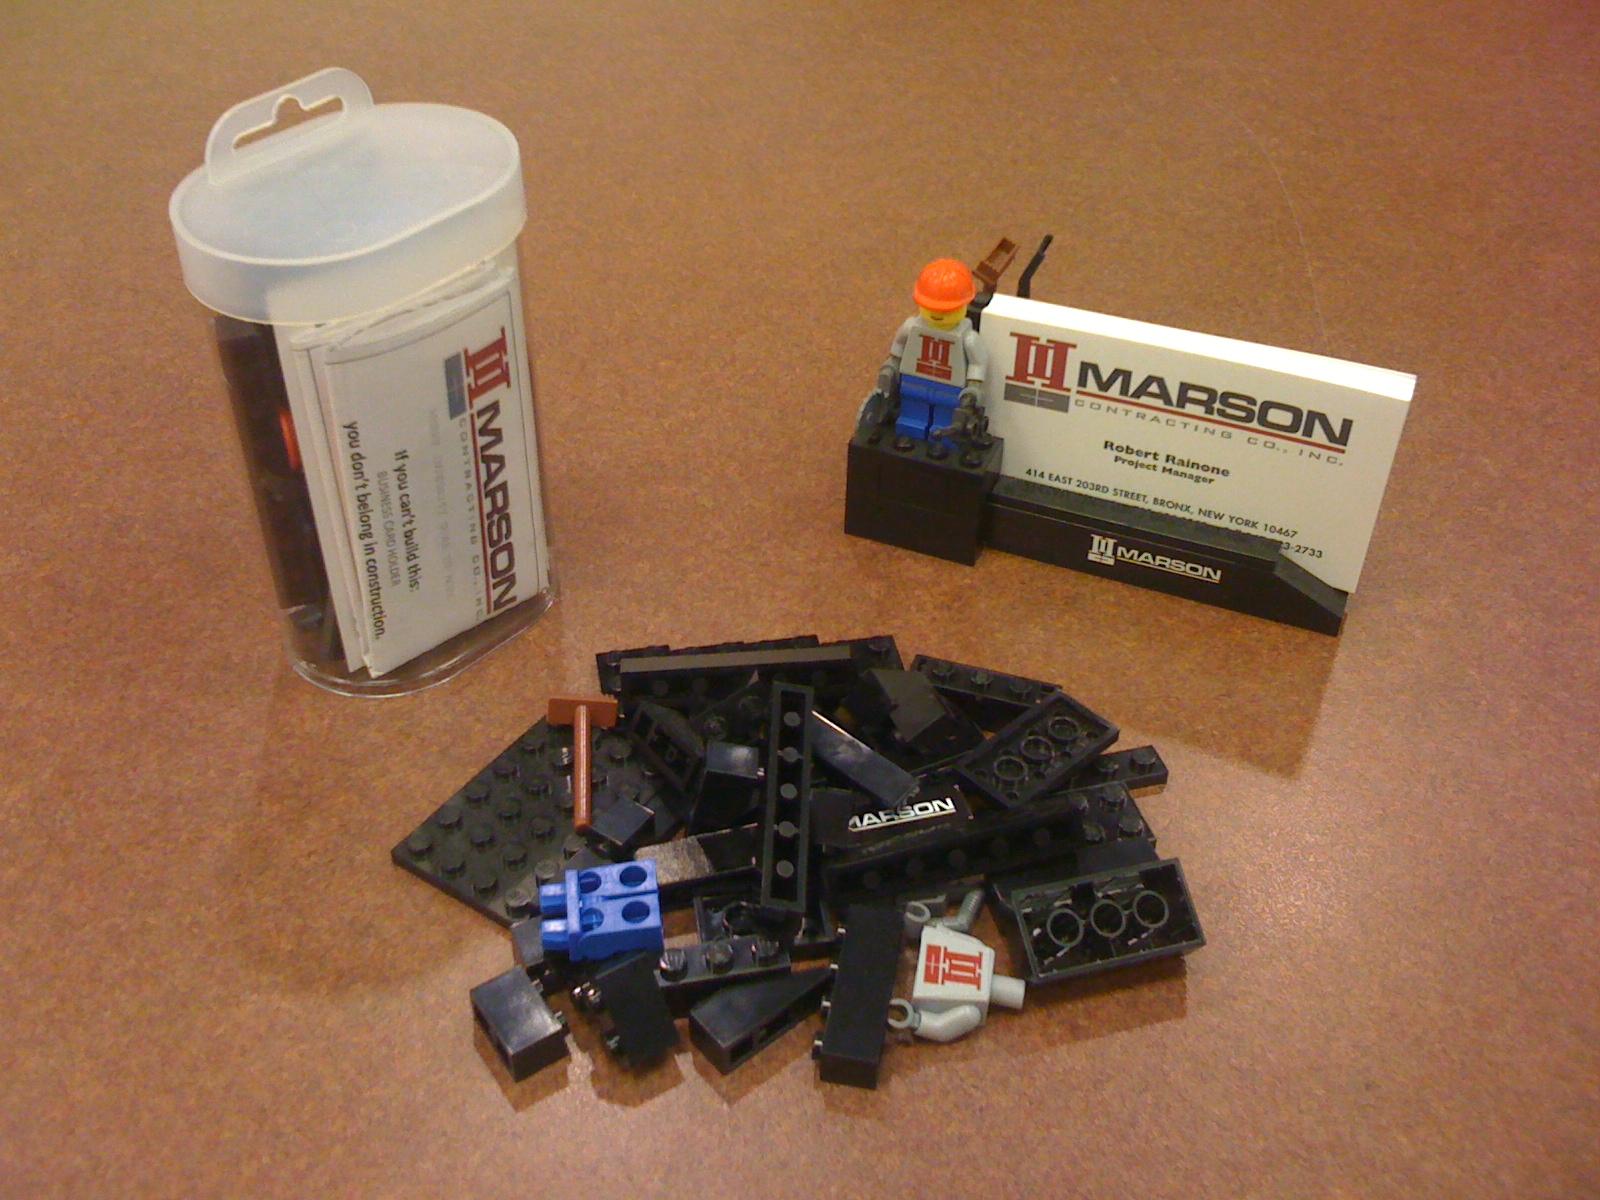 My Creativity Engine: Lego Business Card Holder